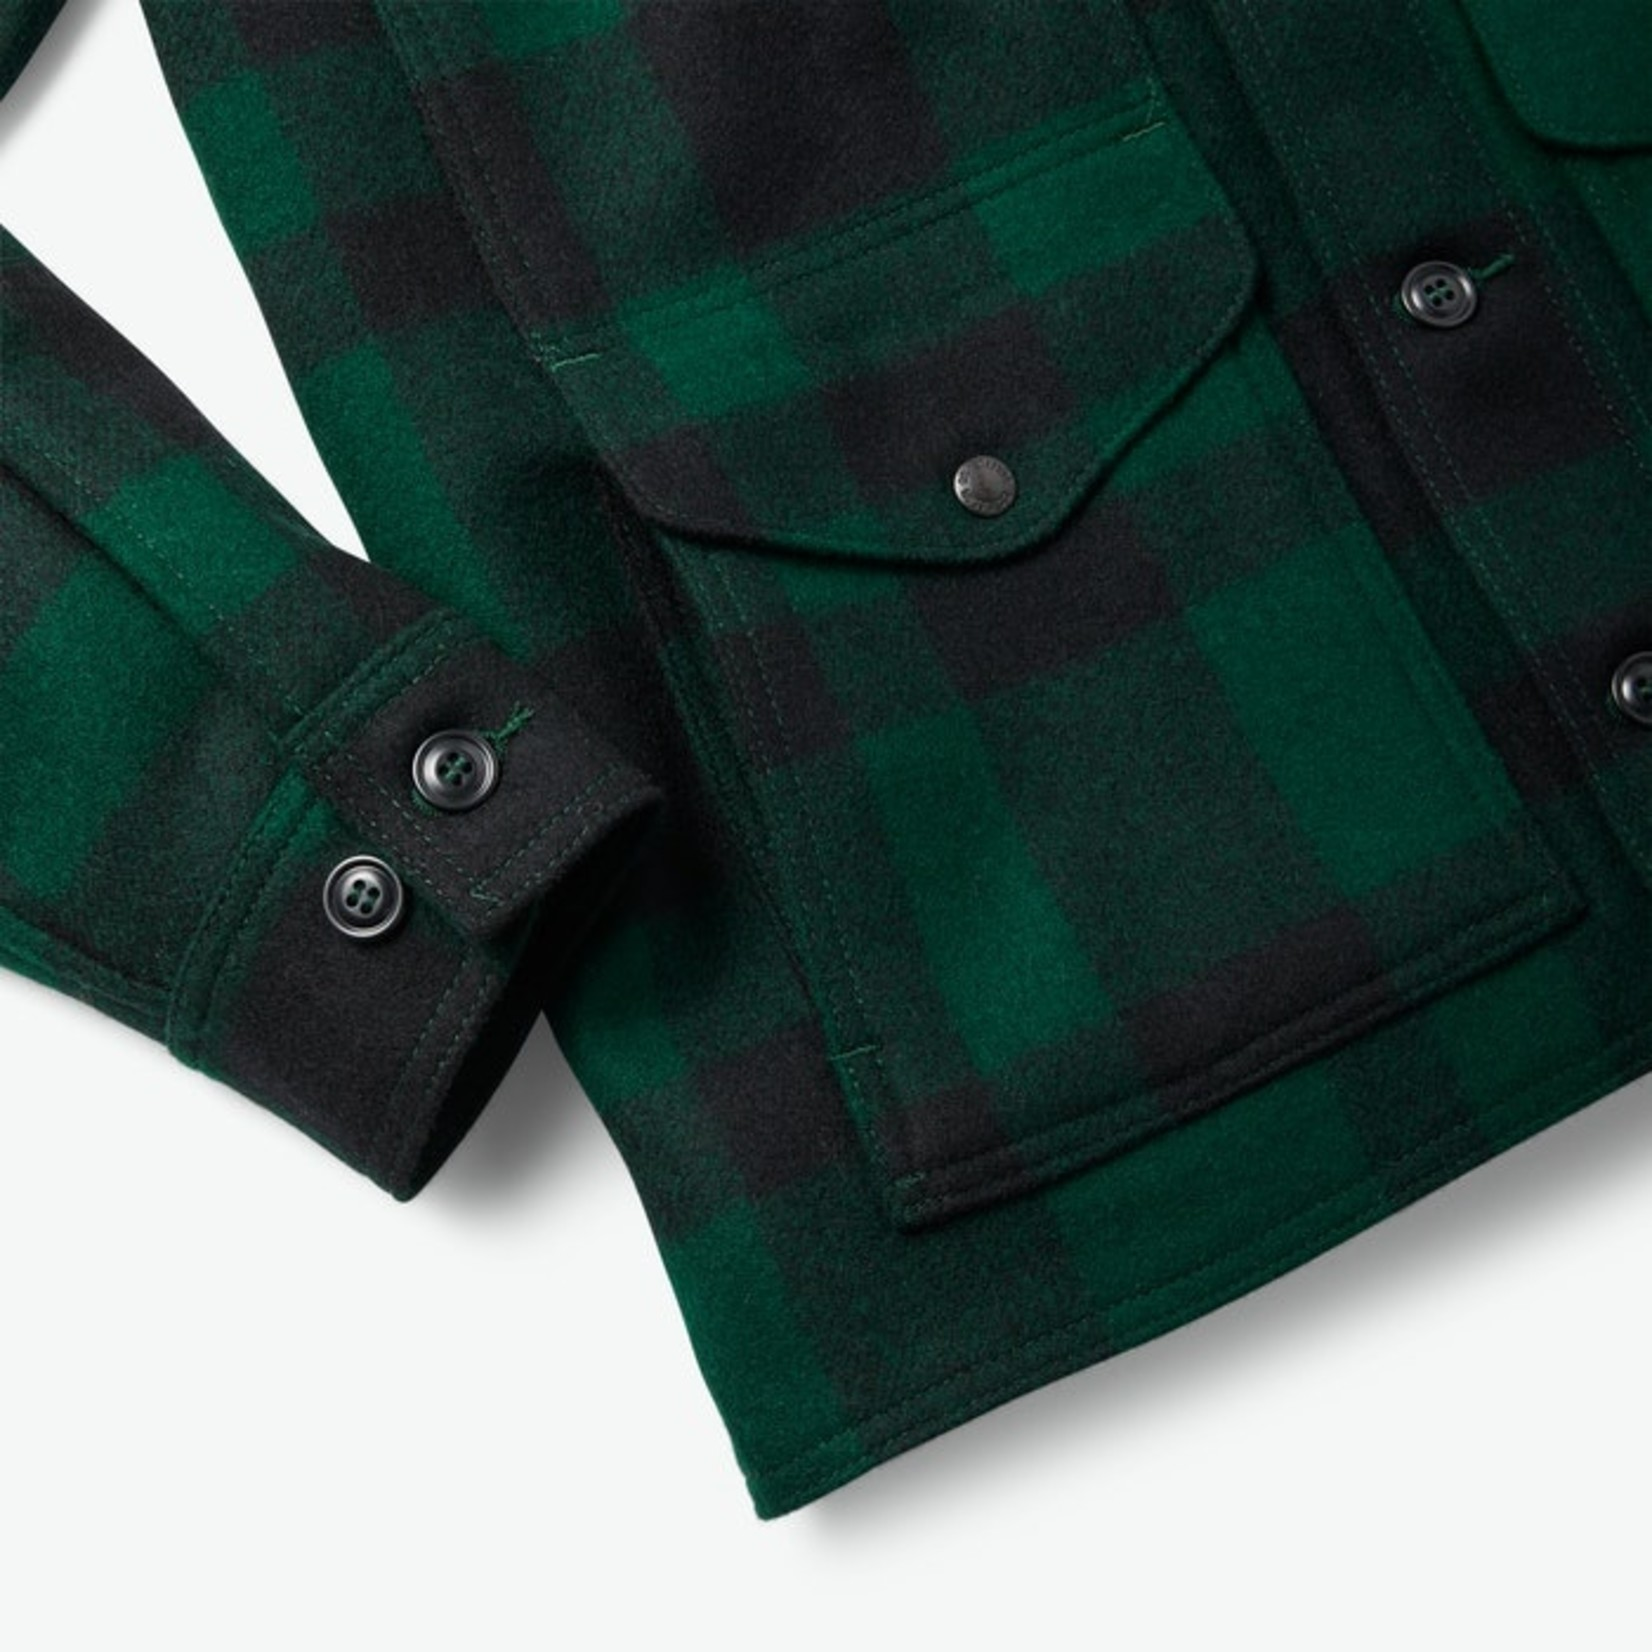 Filson Filson 11010043 Mackinaw Cruiser - Green and Black